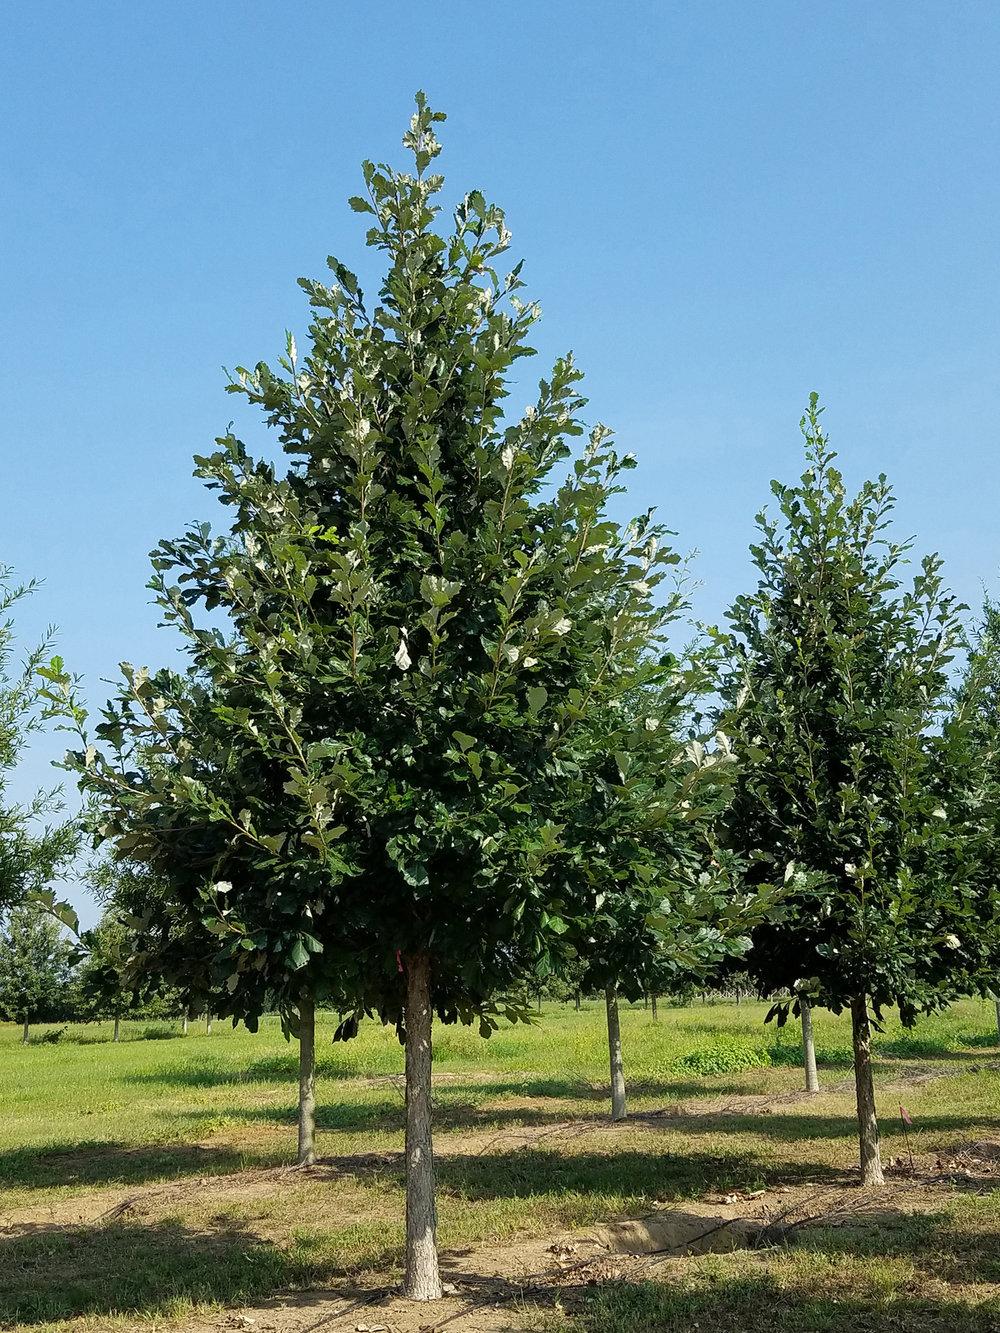 Sun-Breaker-Swamp-White-Oak-Quercus-bicolor-habit.jpg